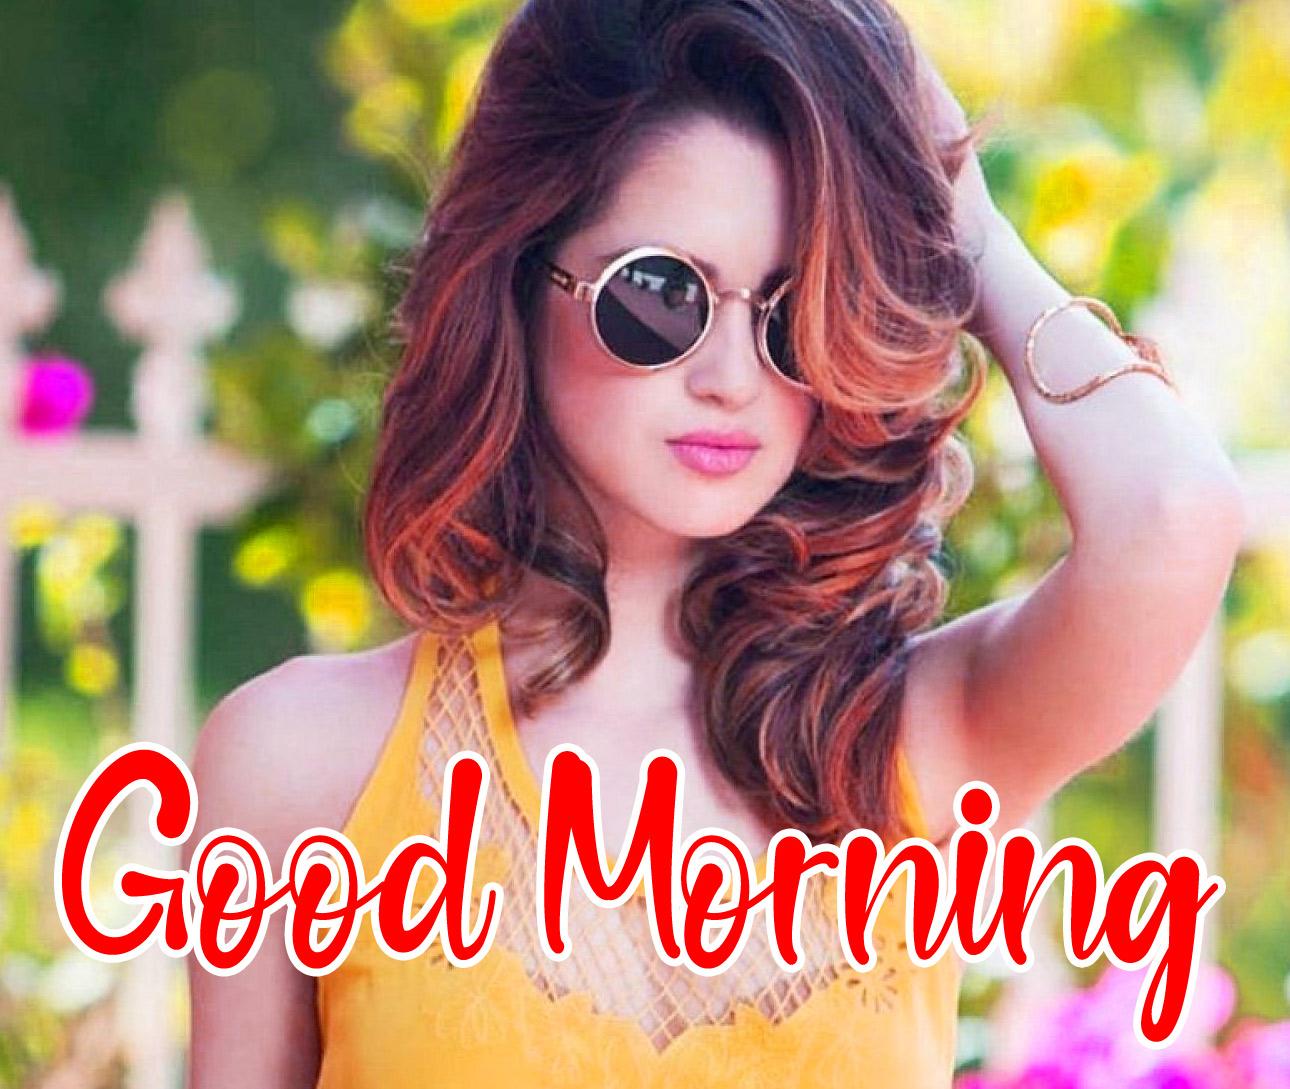 good morning Images for girls 4